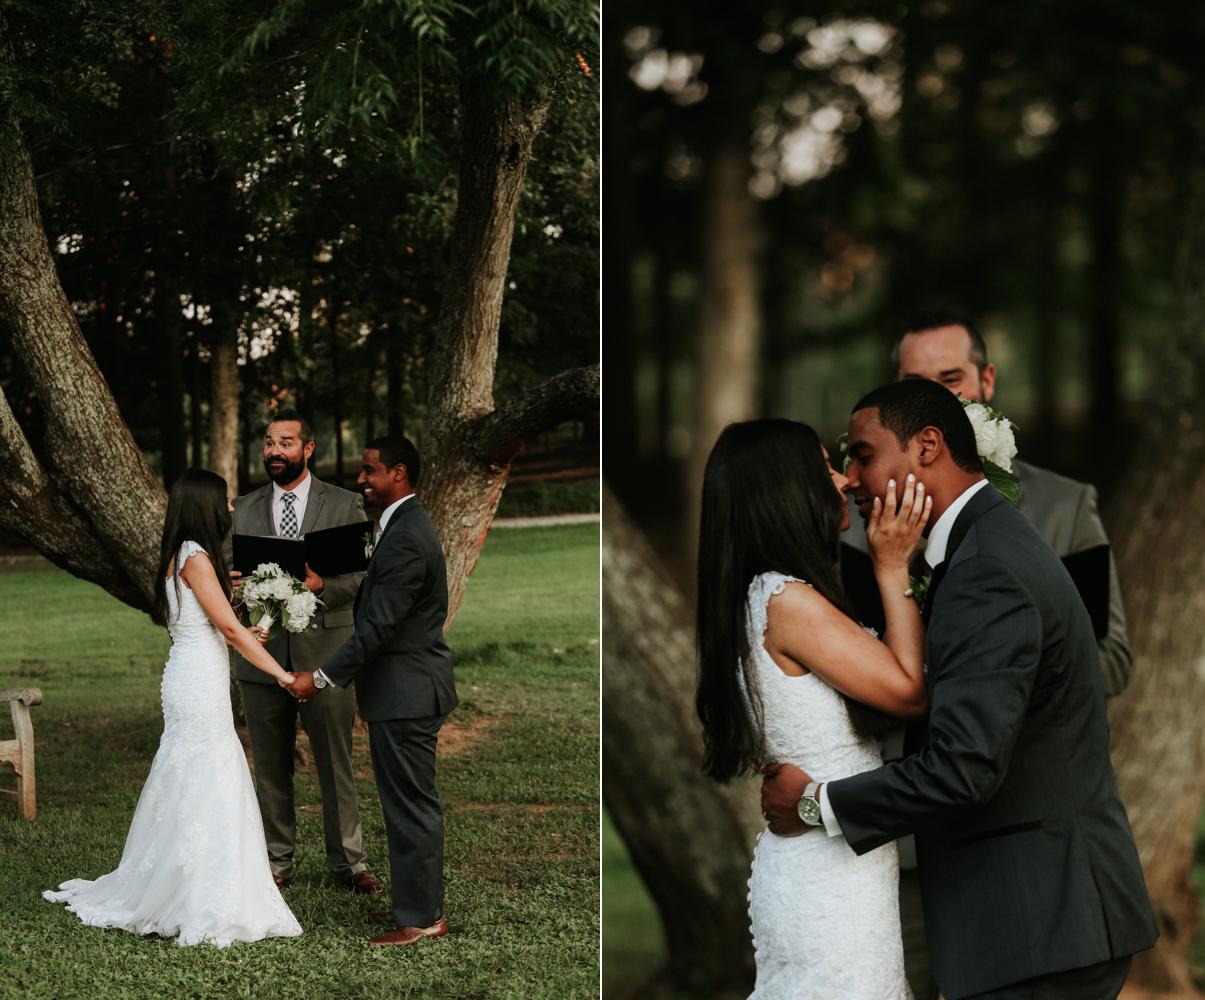 Atlanta_wedding_photographer_Inn_at_Serembe_intimate_elopement_sunset_artistic_photography_Gabriela_and_Felipe_doble22.jpg